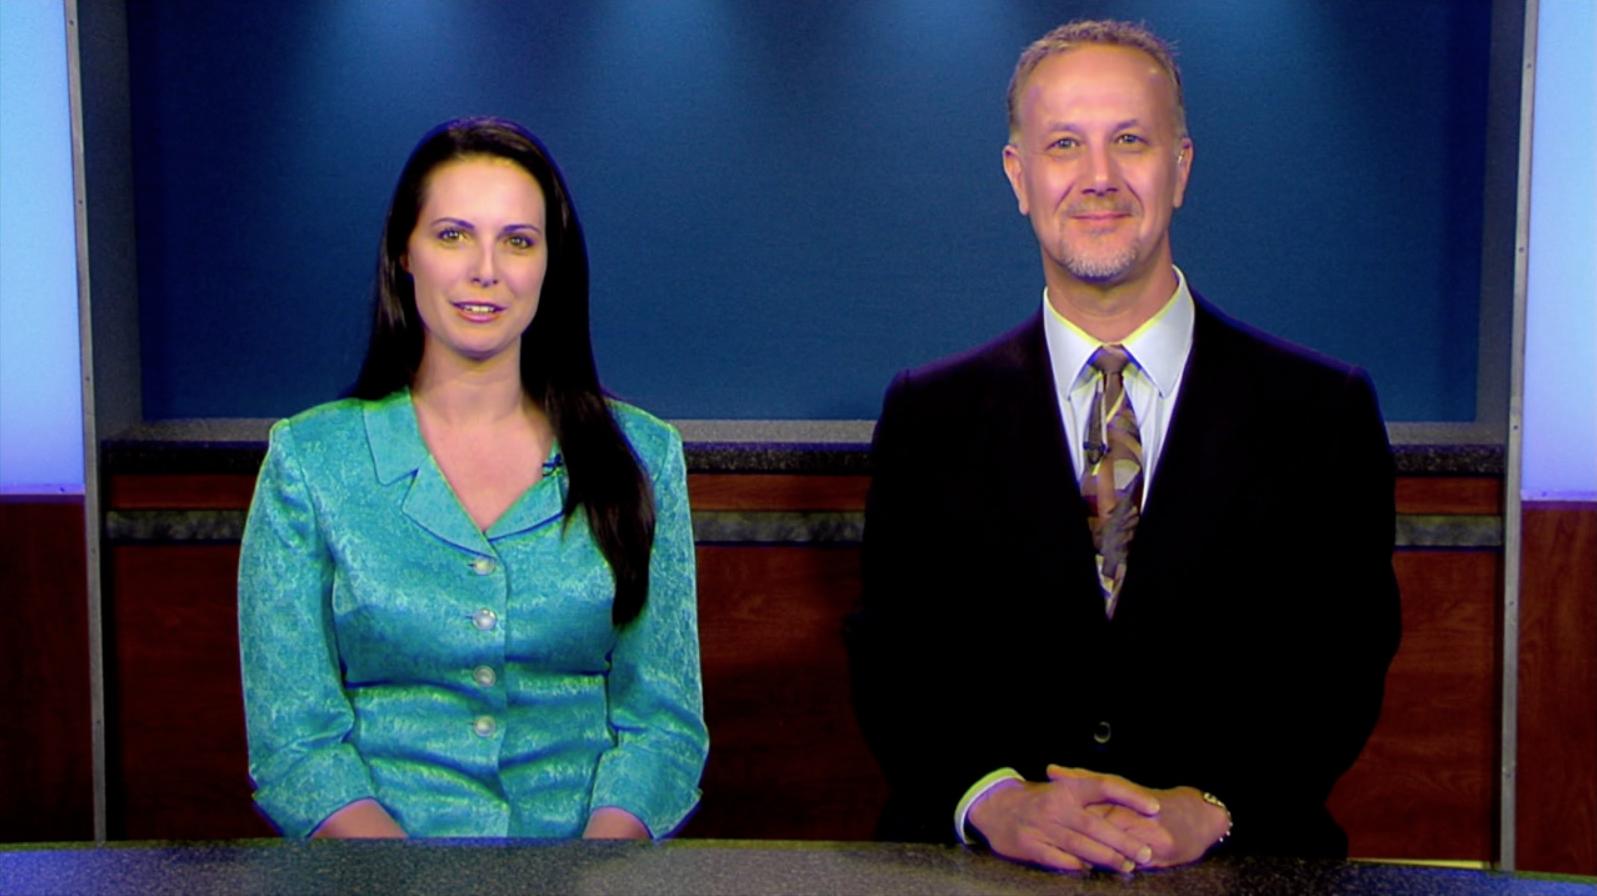 Newscast: October 9, 2013